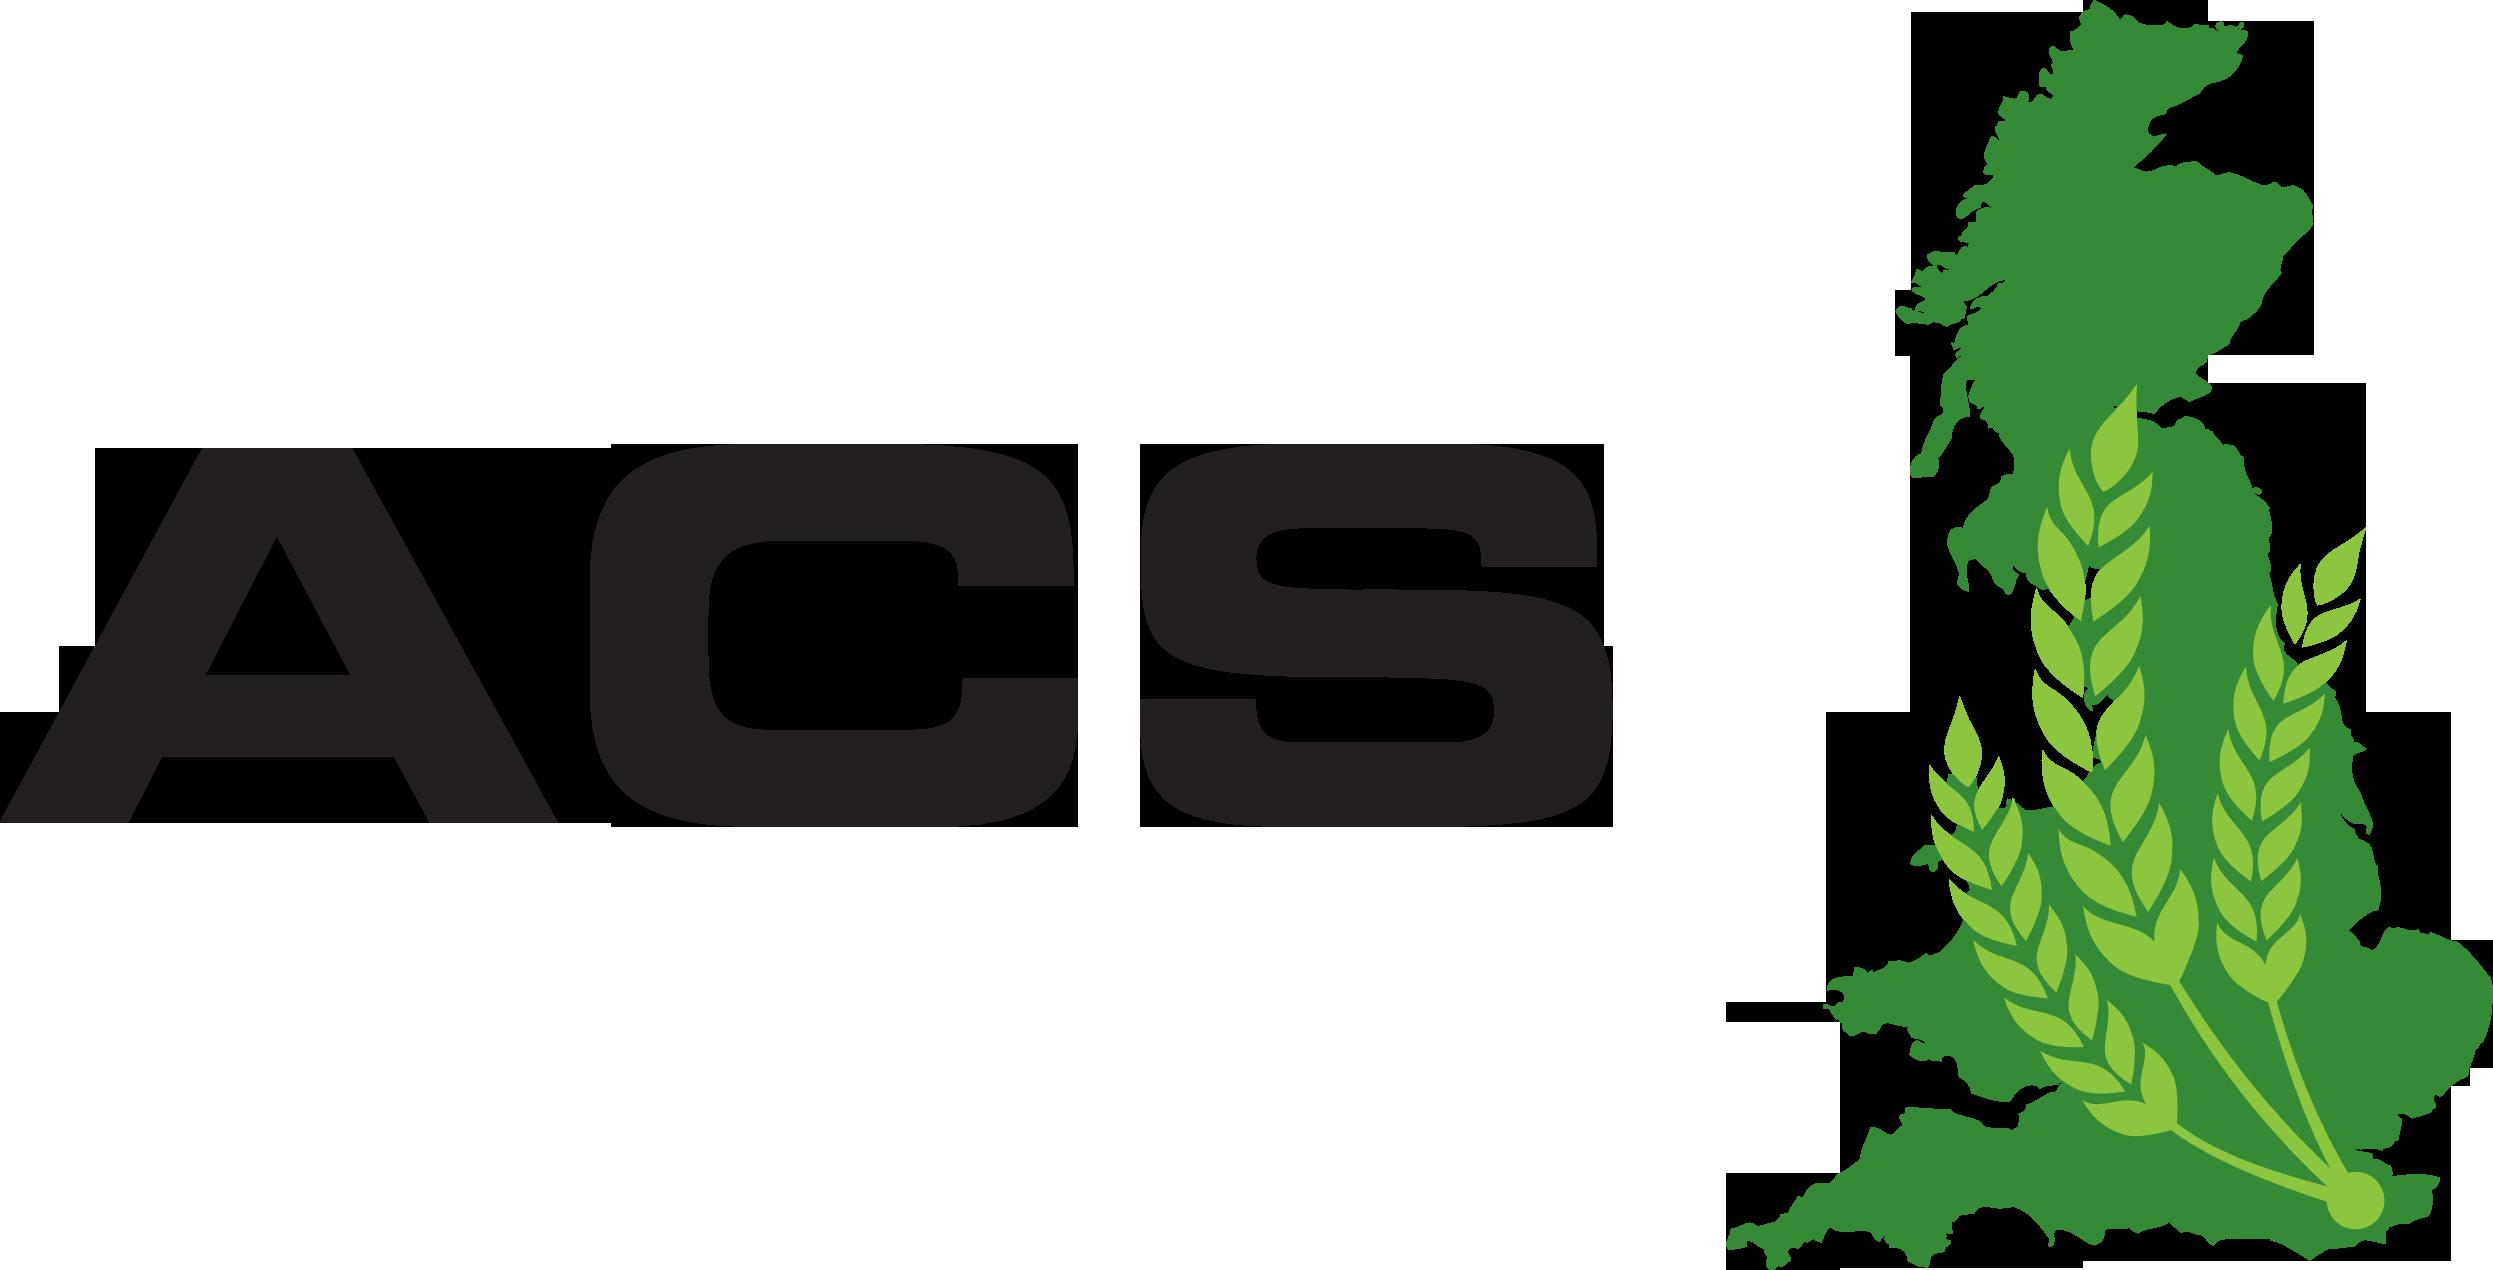 ACS Group - Canterbury and Sittingbourne, Kent